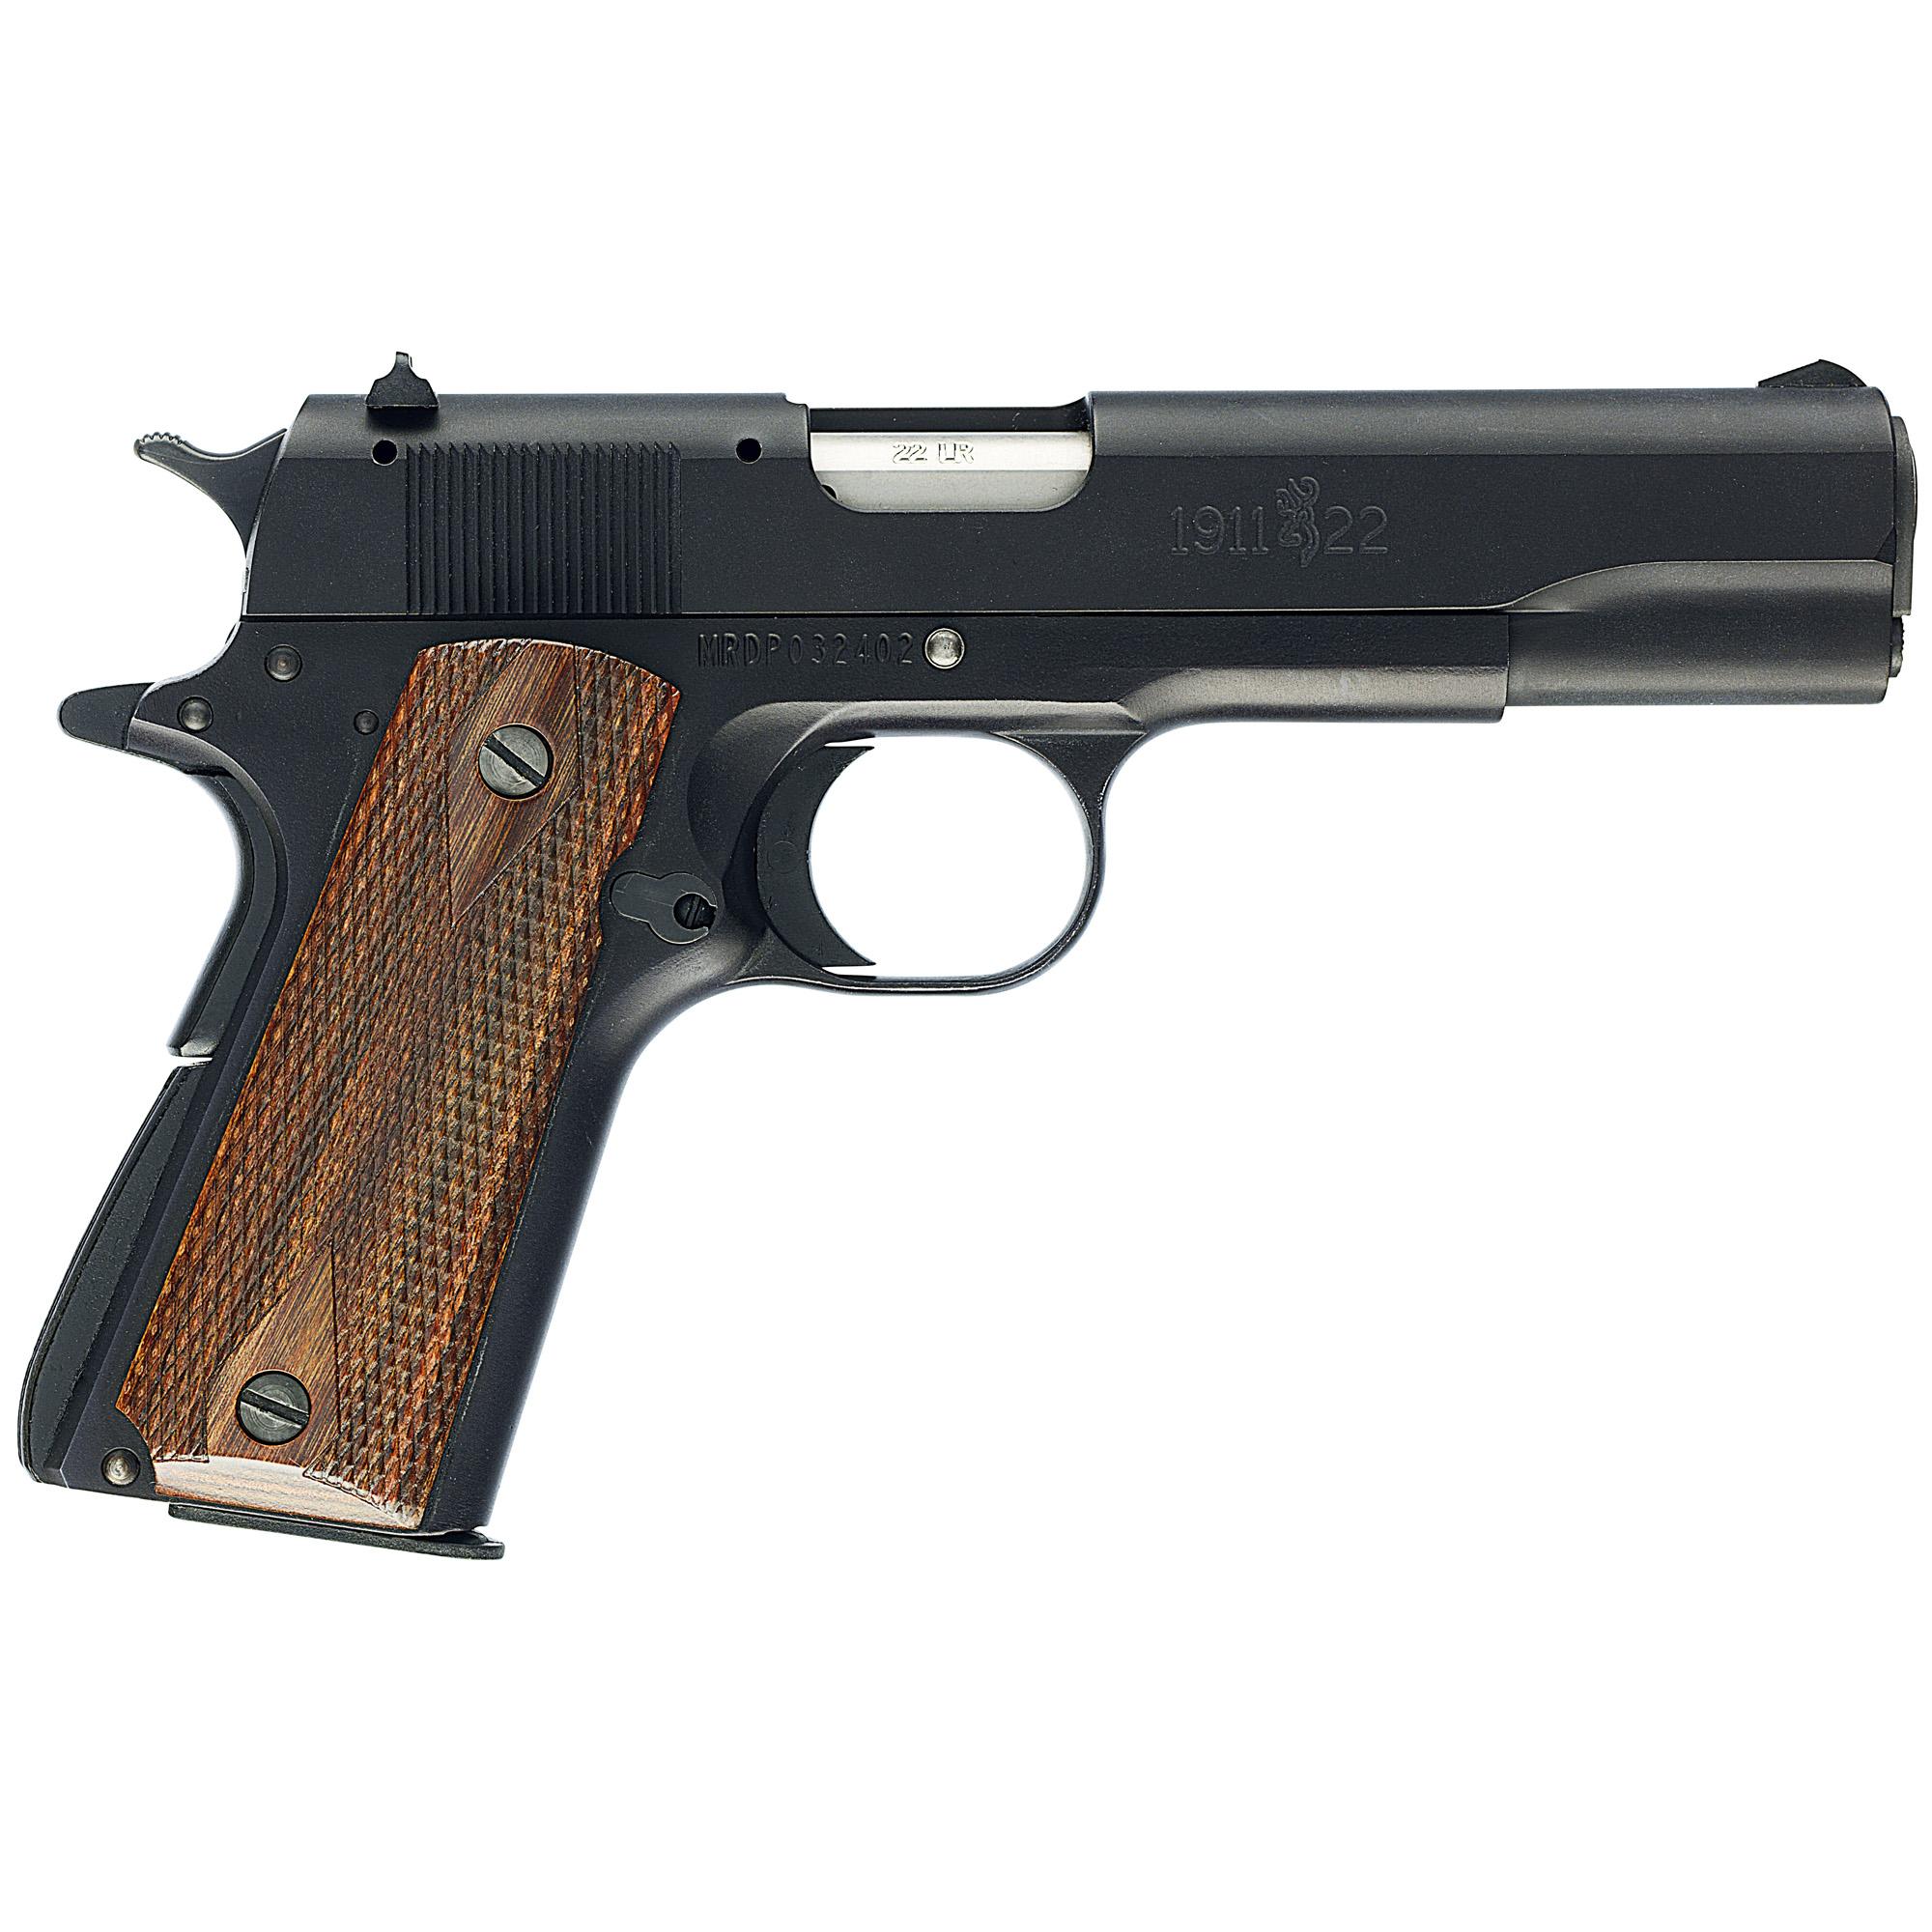 "Brown 1911-22a1 Fs 4.25"" 22lr 10rd"